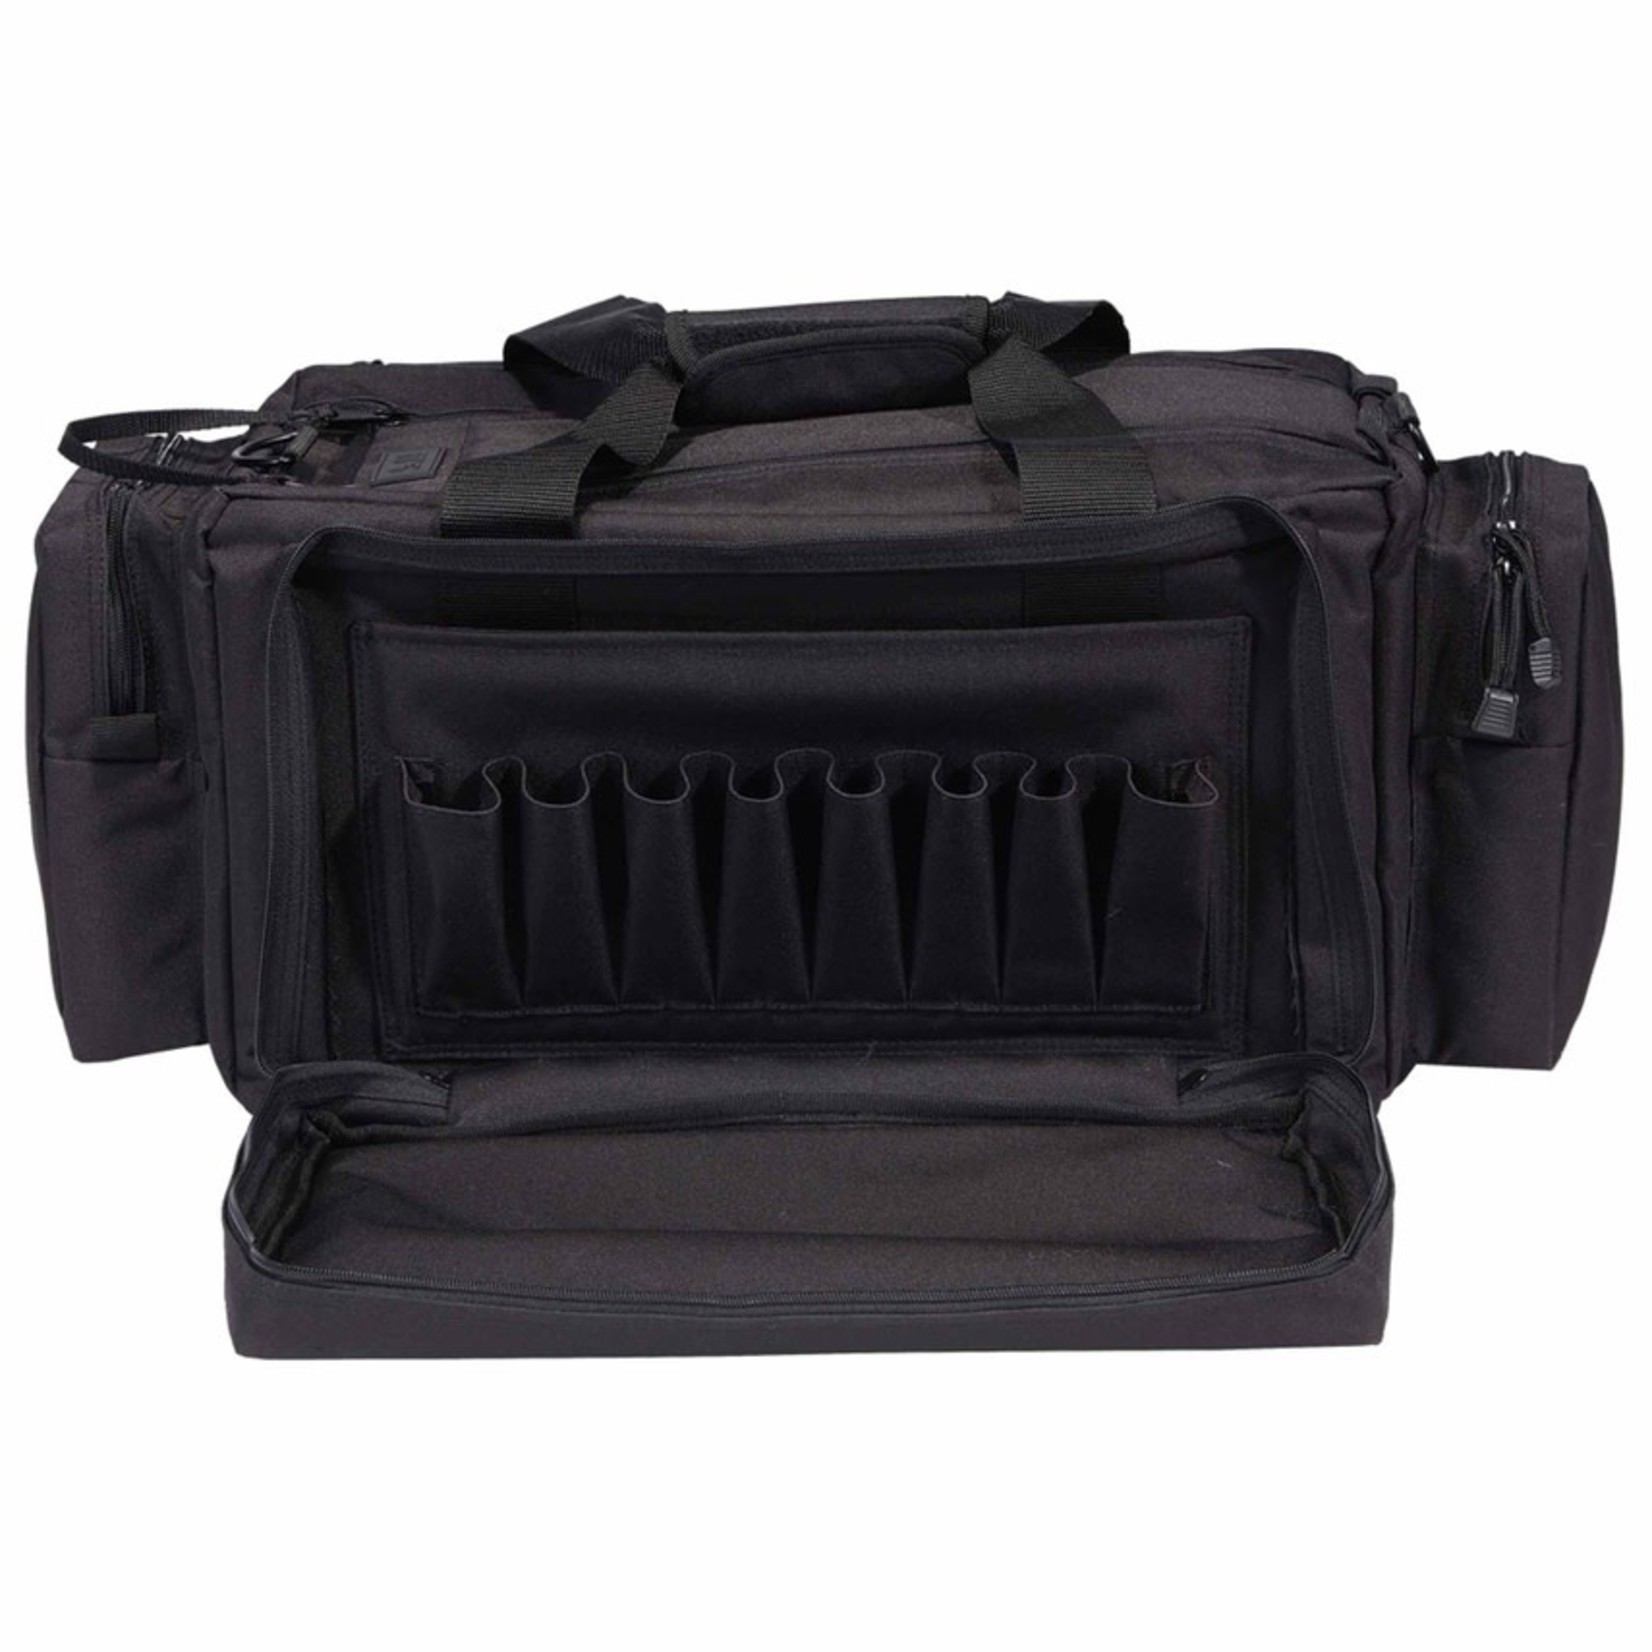 5.11 Tactical 5.11 Range Ready Bag